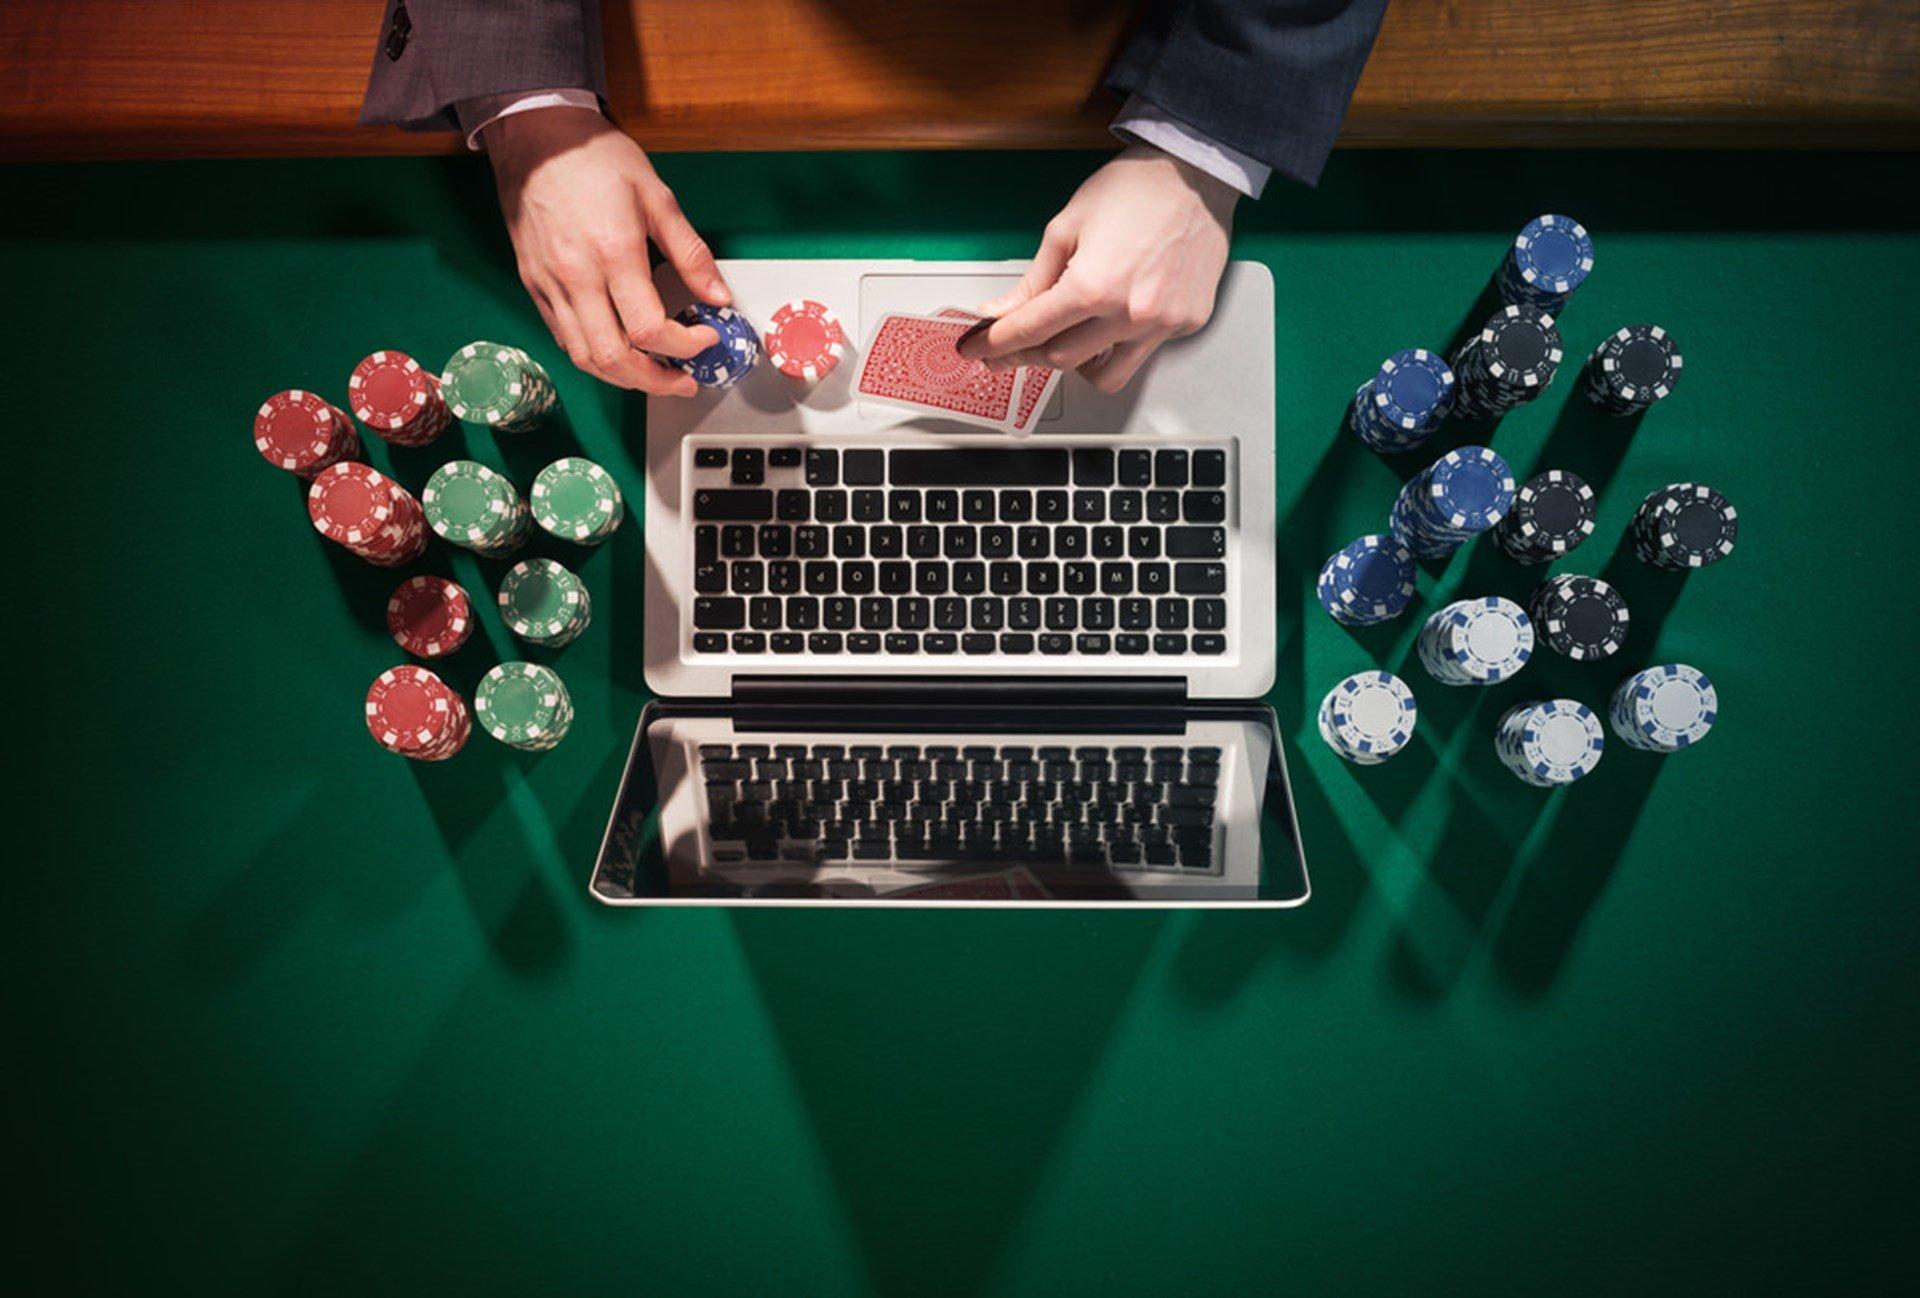 Vera John Casino The Premier Online Gambling Destination The